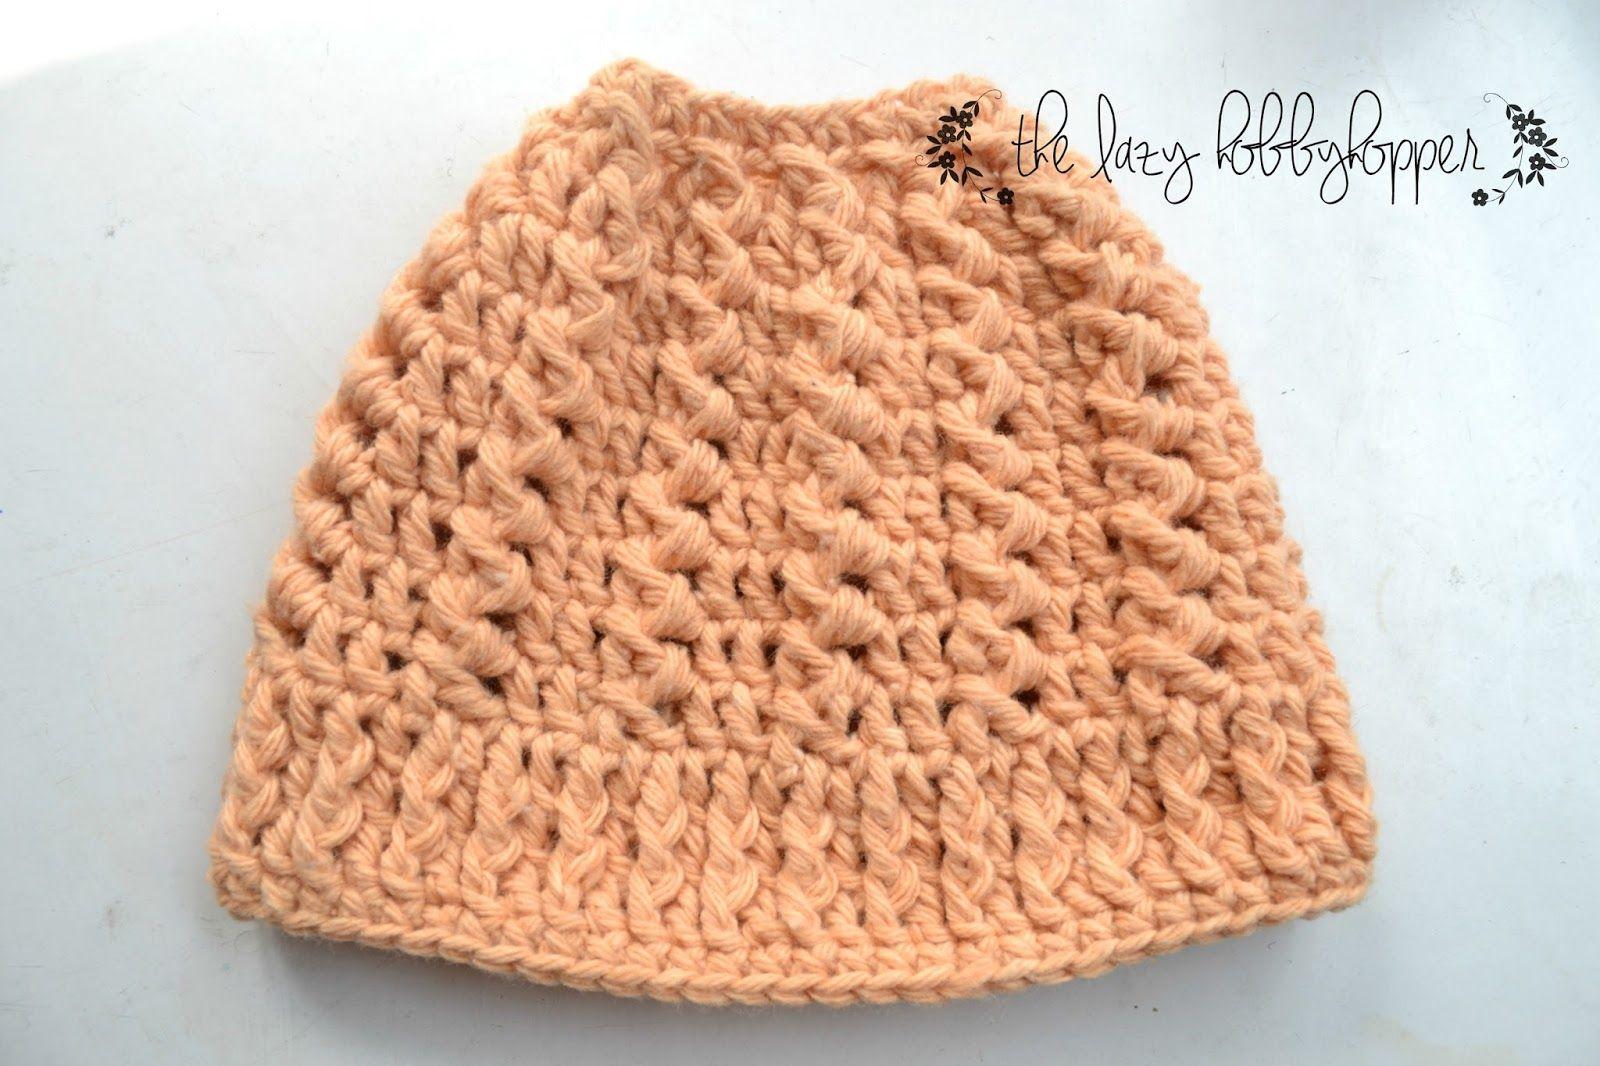 Pin de Linda Dart en Crochet Hats | Pinterest